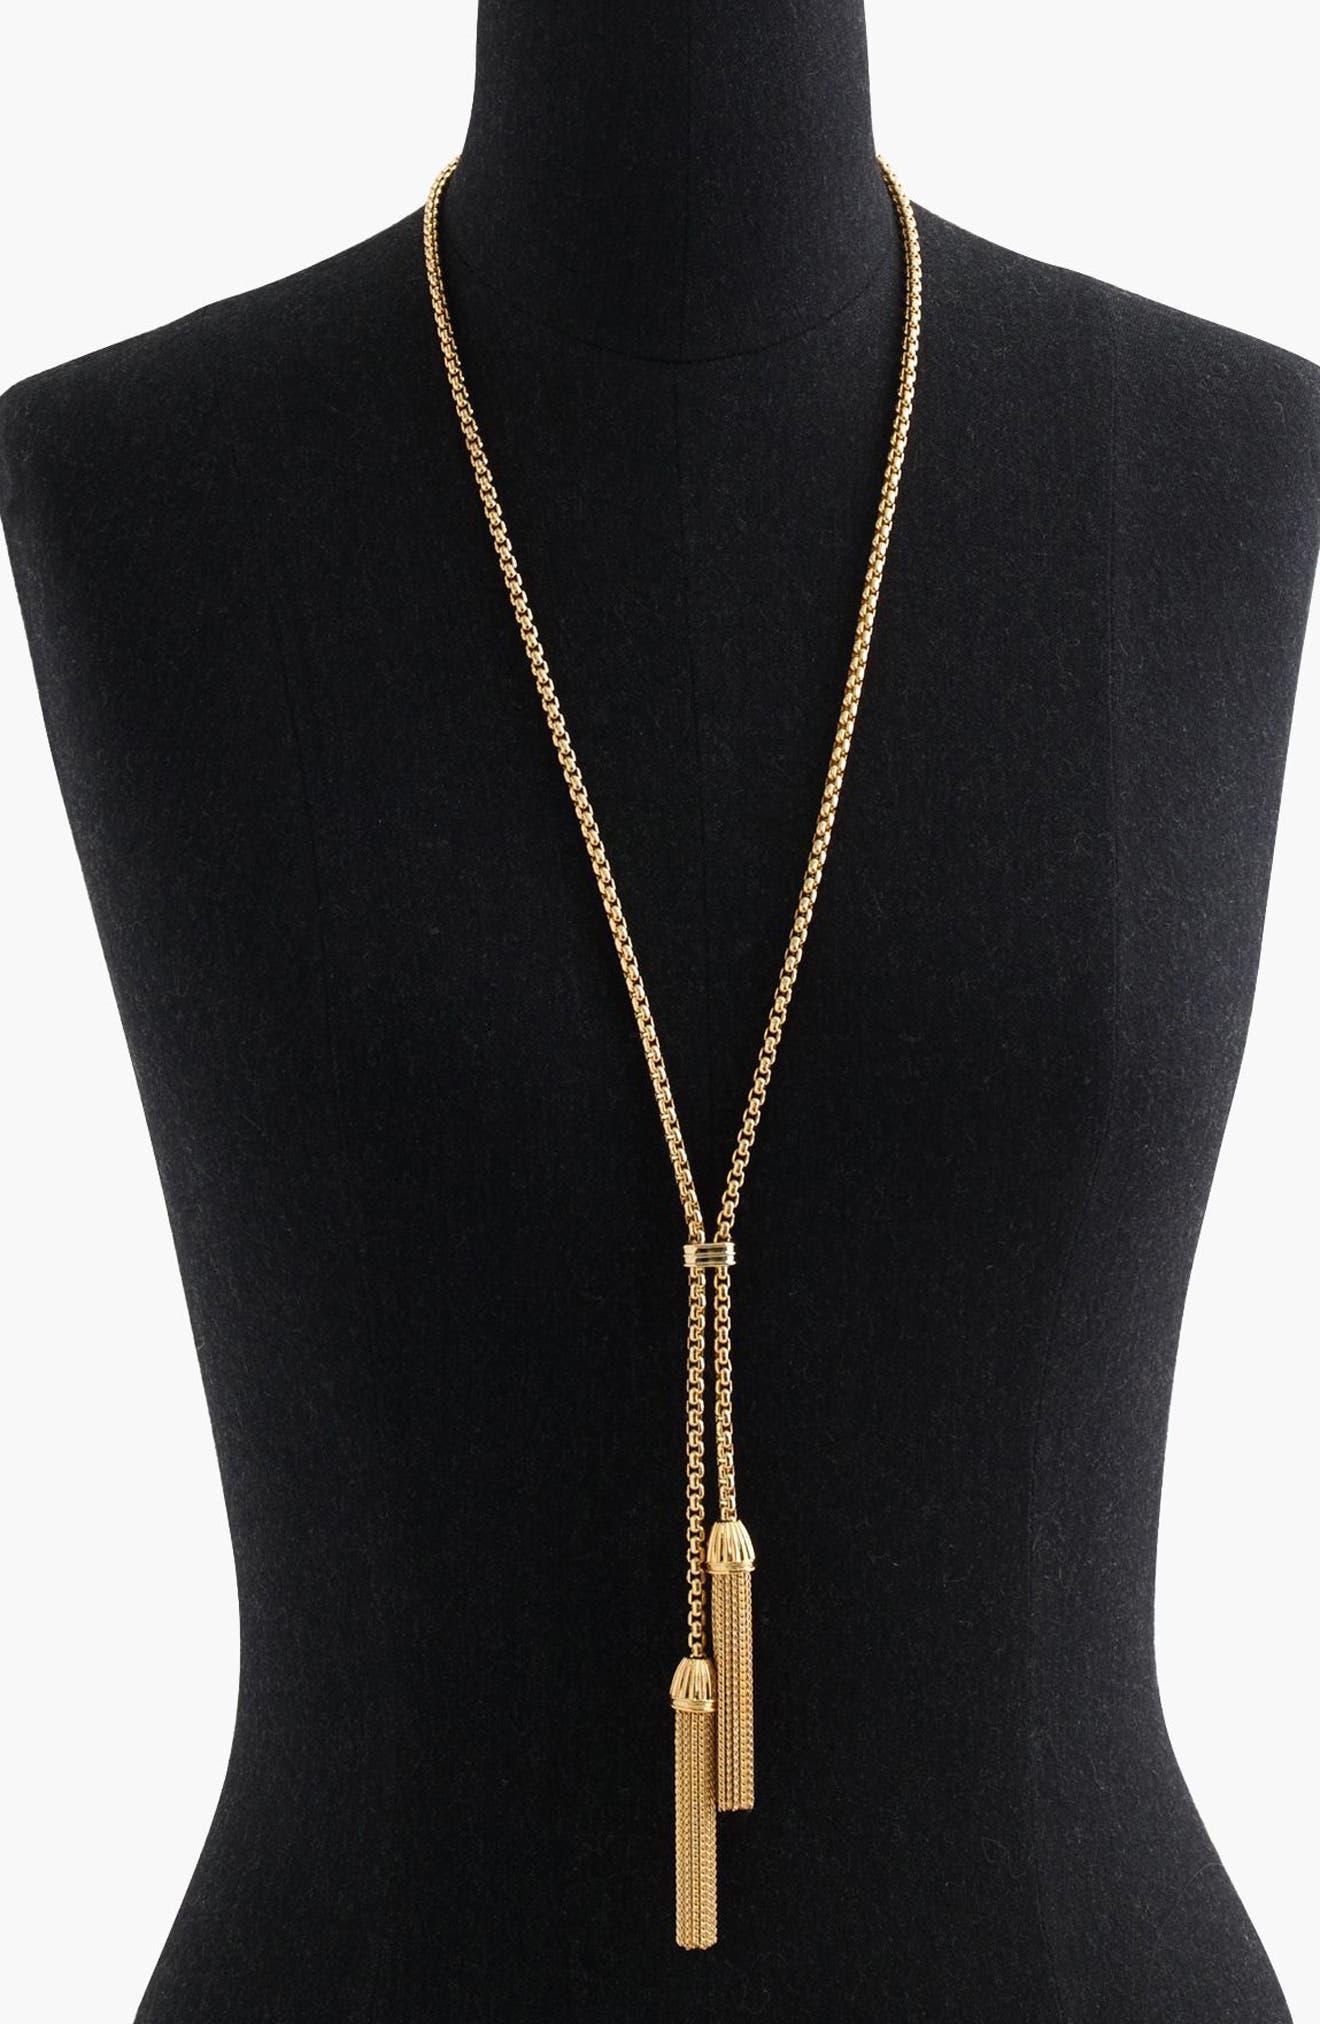 Main Image - J.Crew Tassel Pendant Necklace